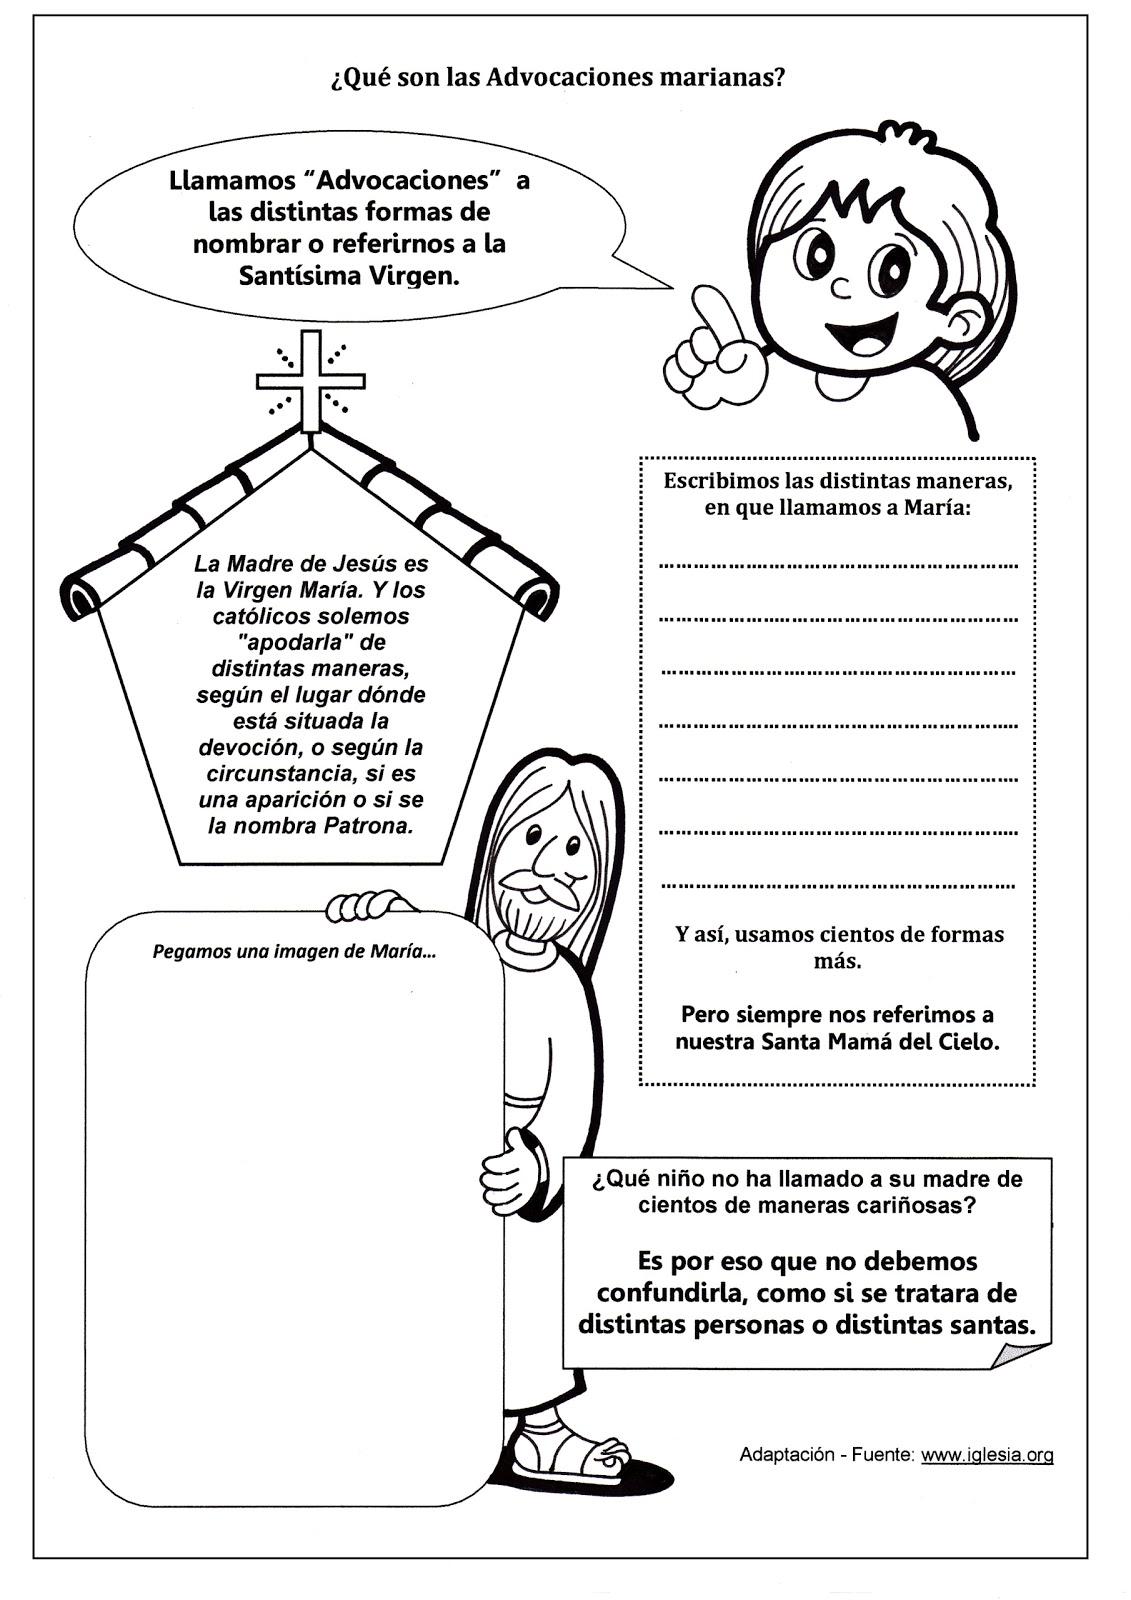 La Virgen Mara: Ficha de la Virgen Mara